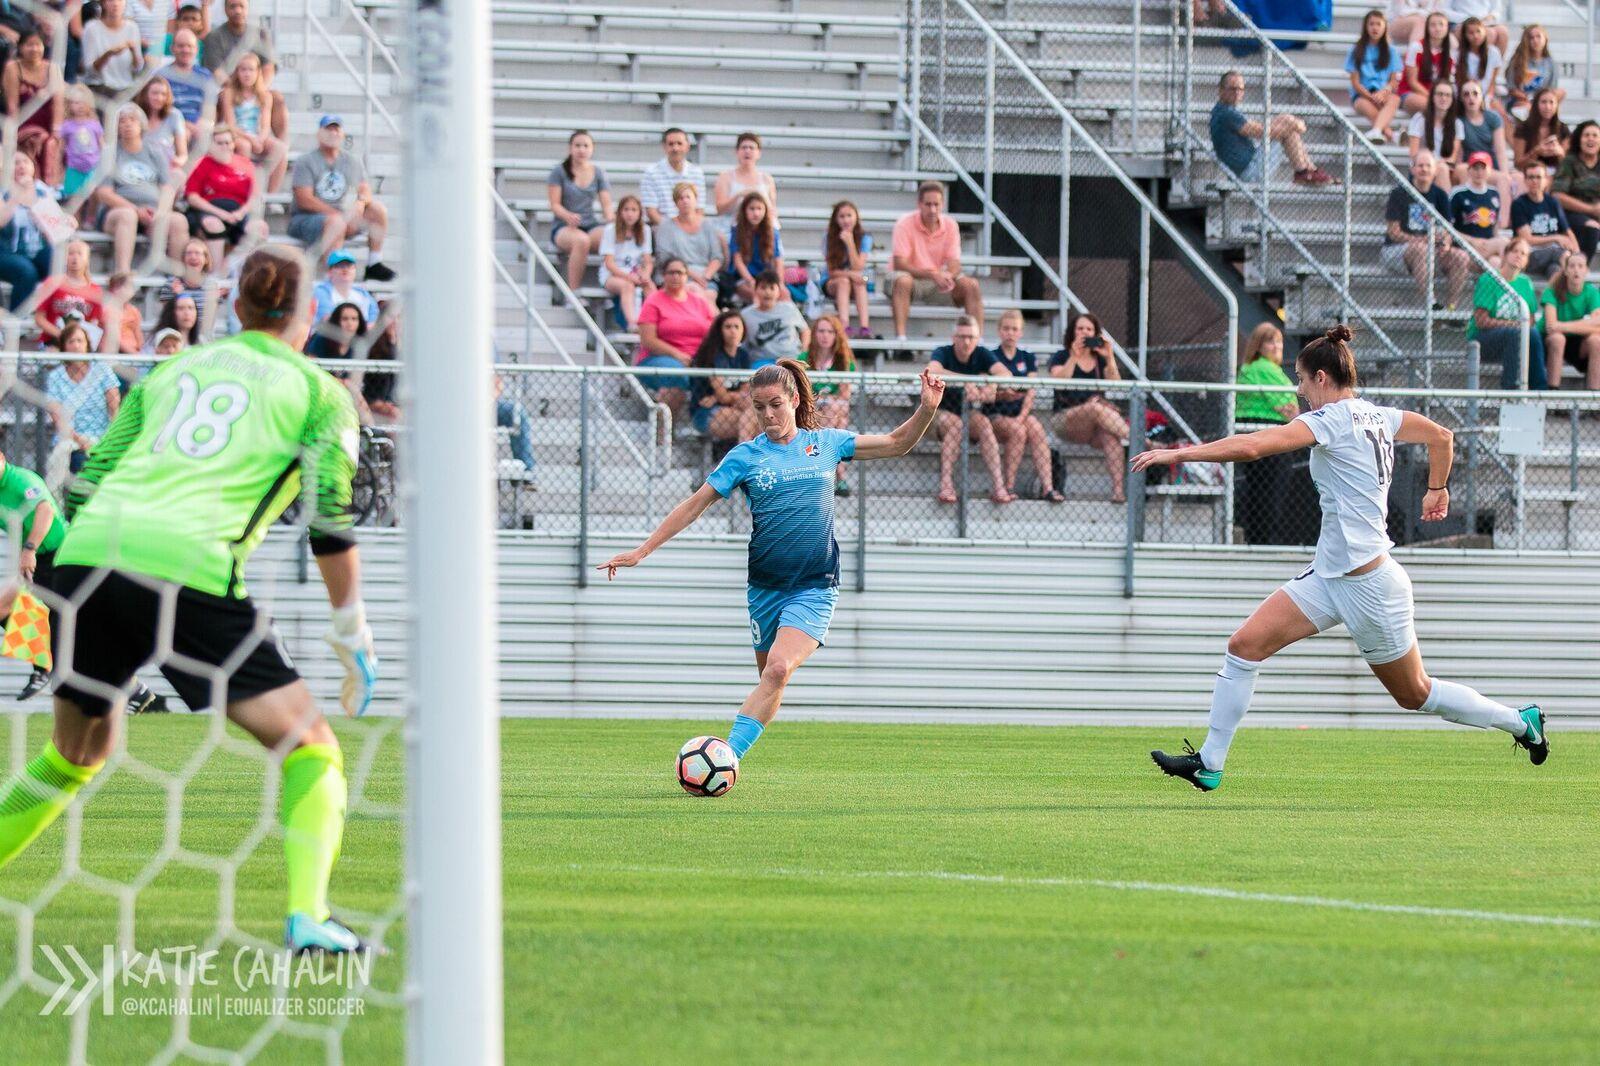 Kelley O'Hara pushing forward against FC Kansas City (photo copyright Katie Cahalin for The Equalizer)